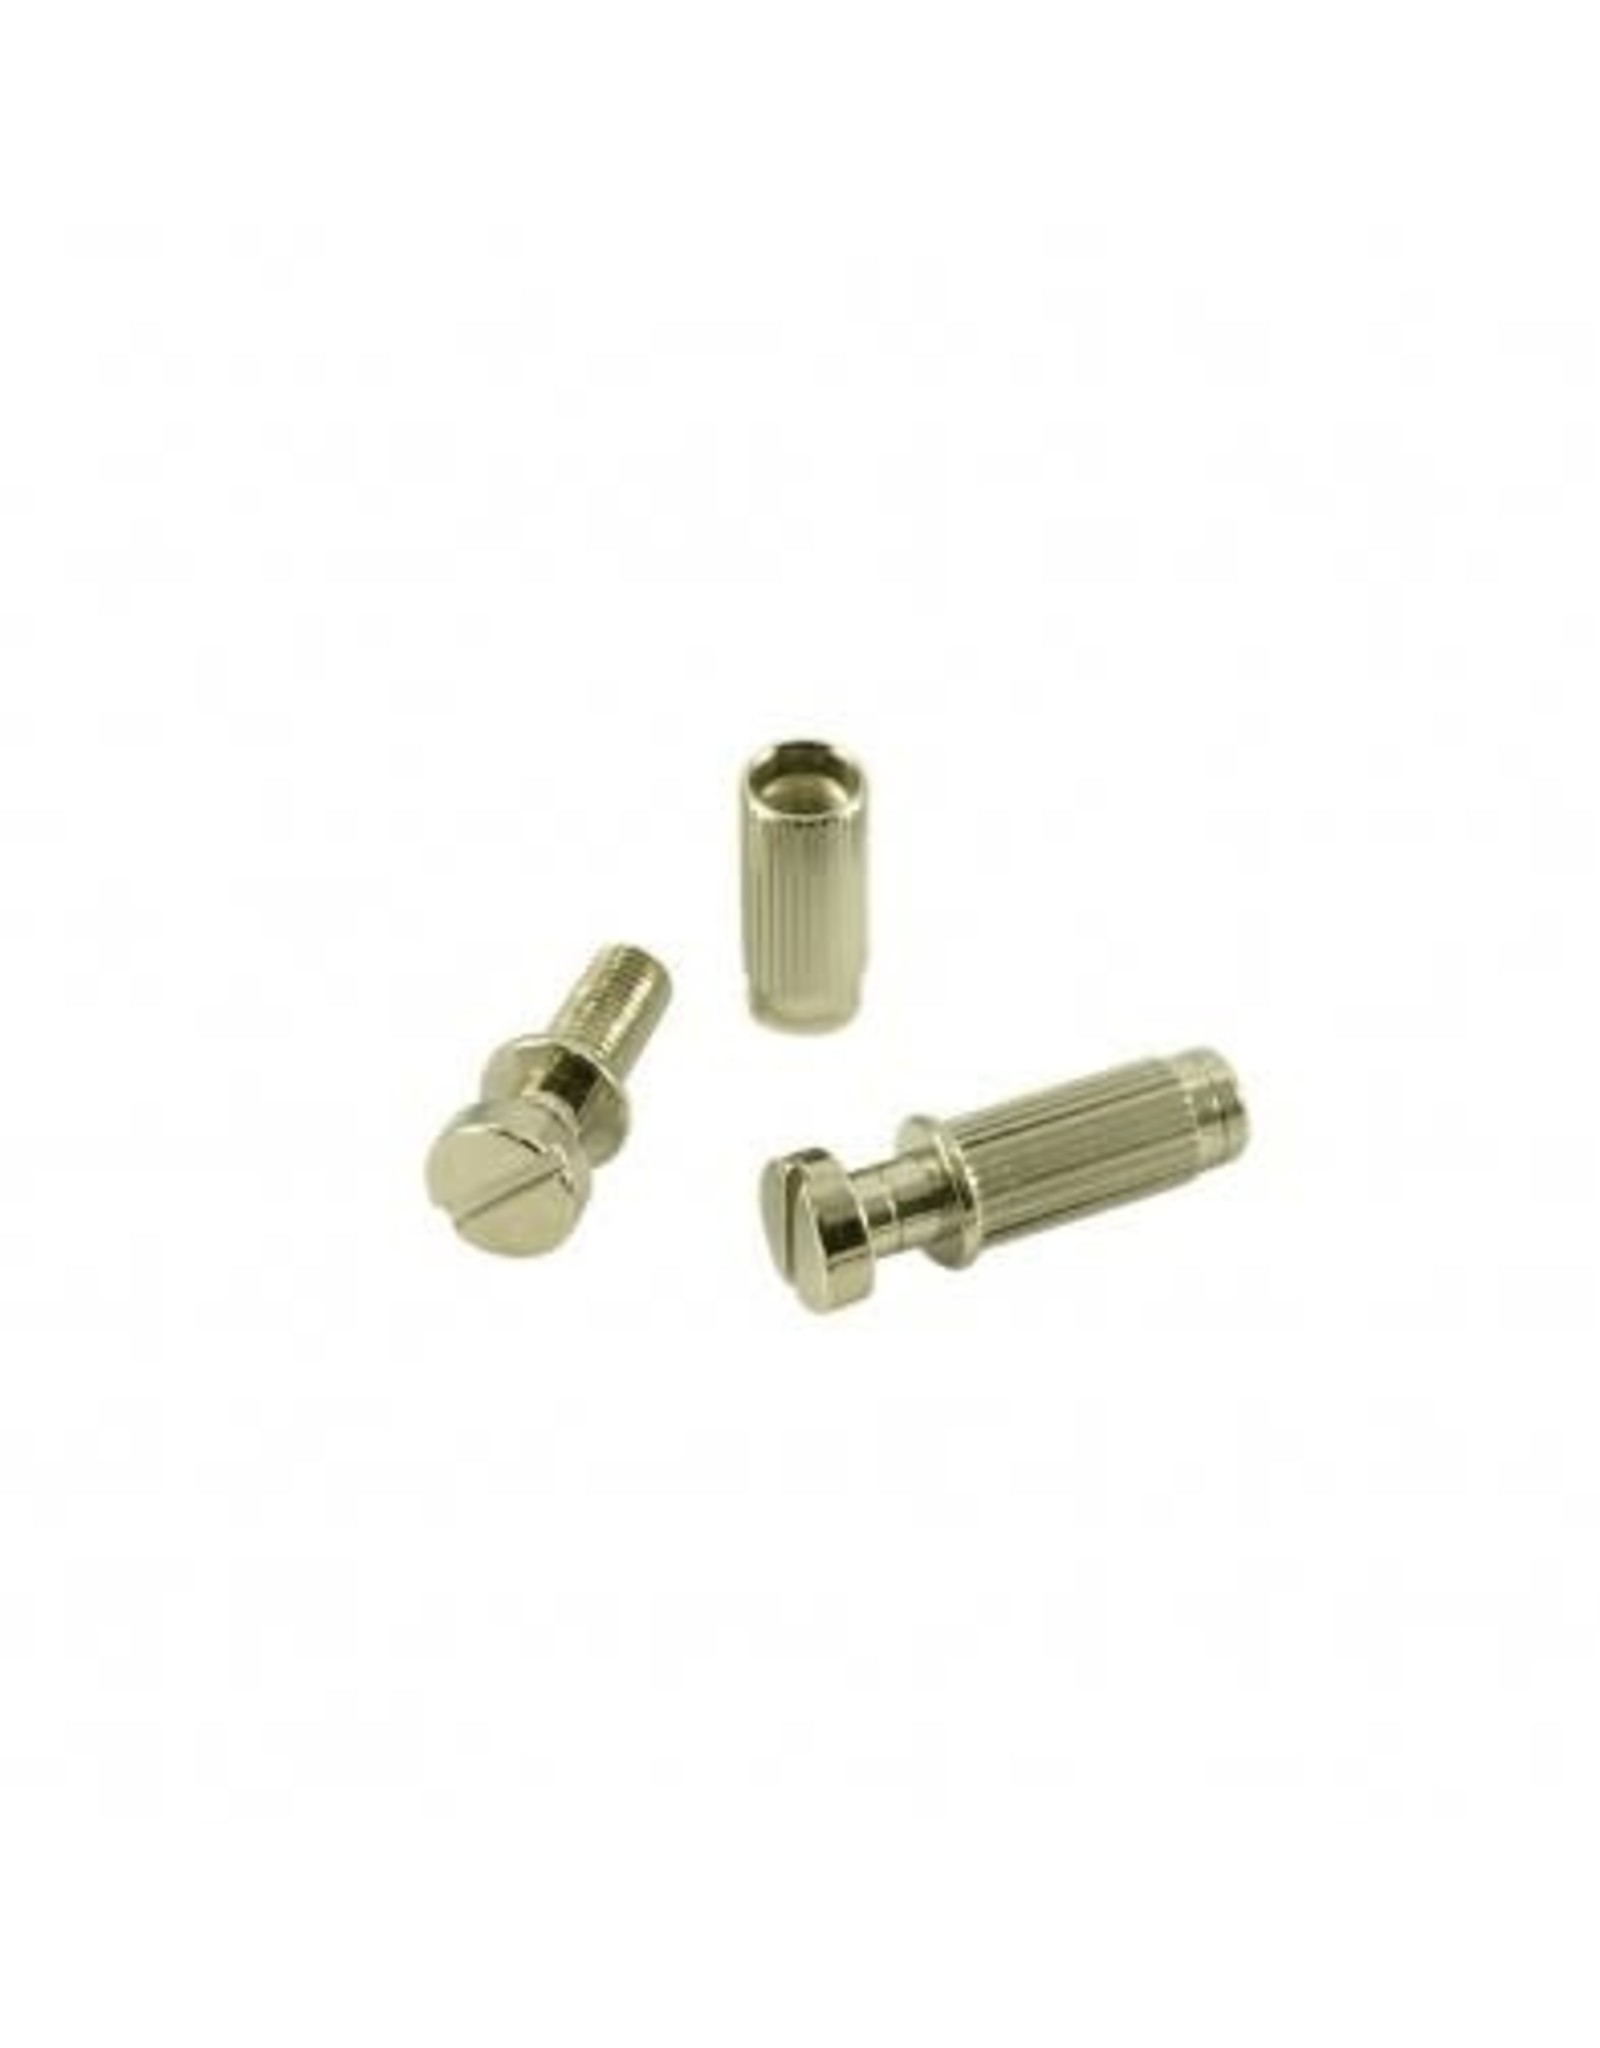 WDMusic WD® 4 Piece Stop Tailpiece Stud & Insert Set With USA Threads Nickel